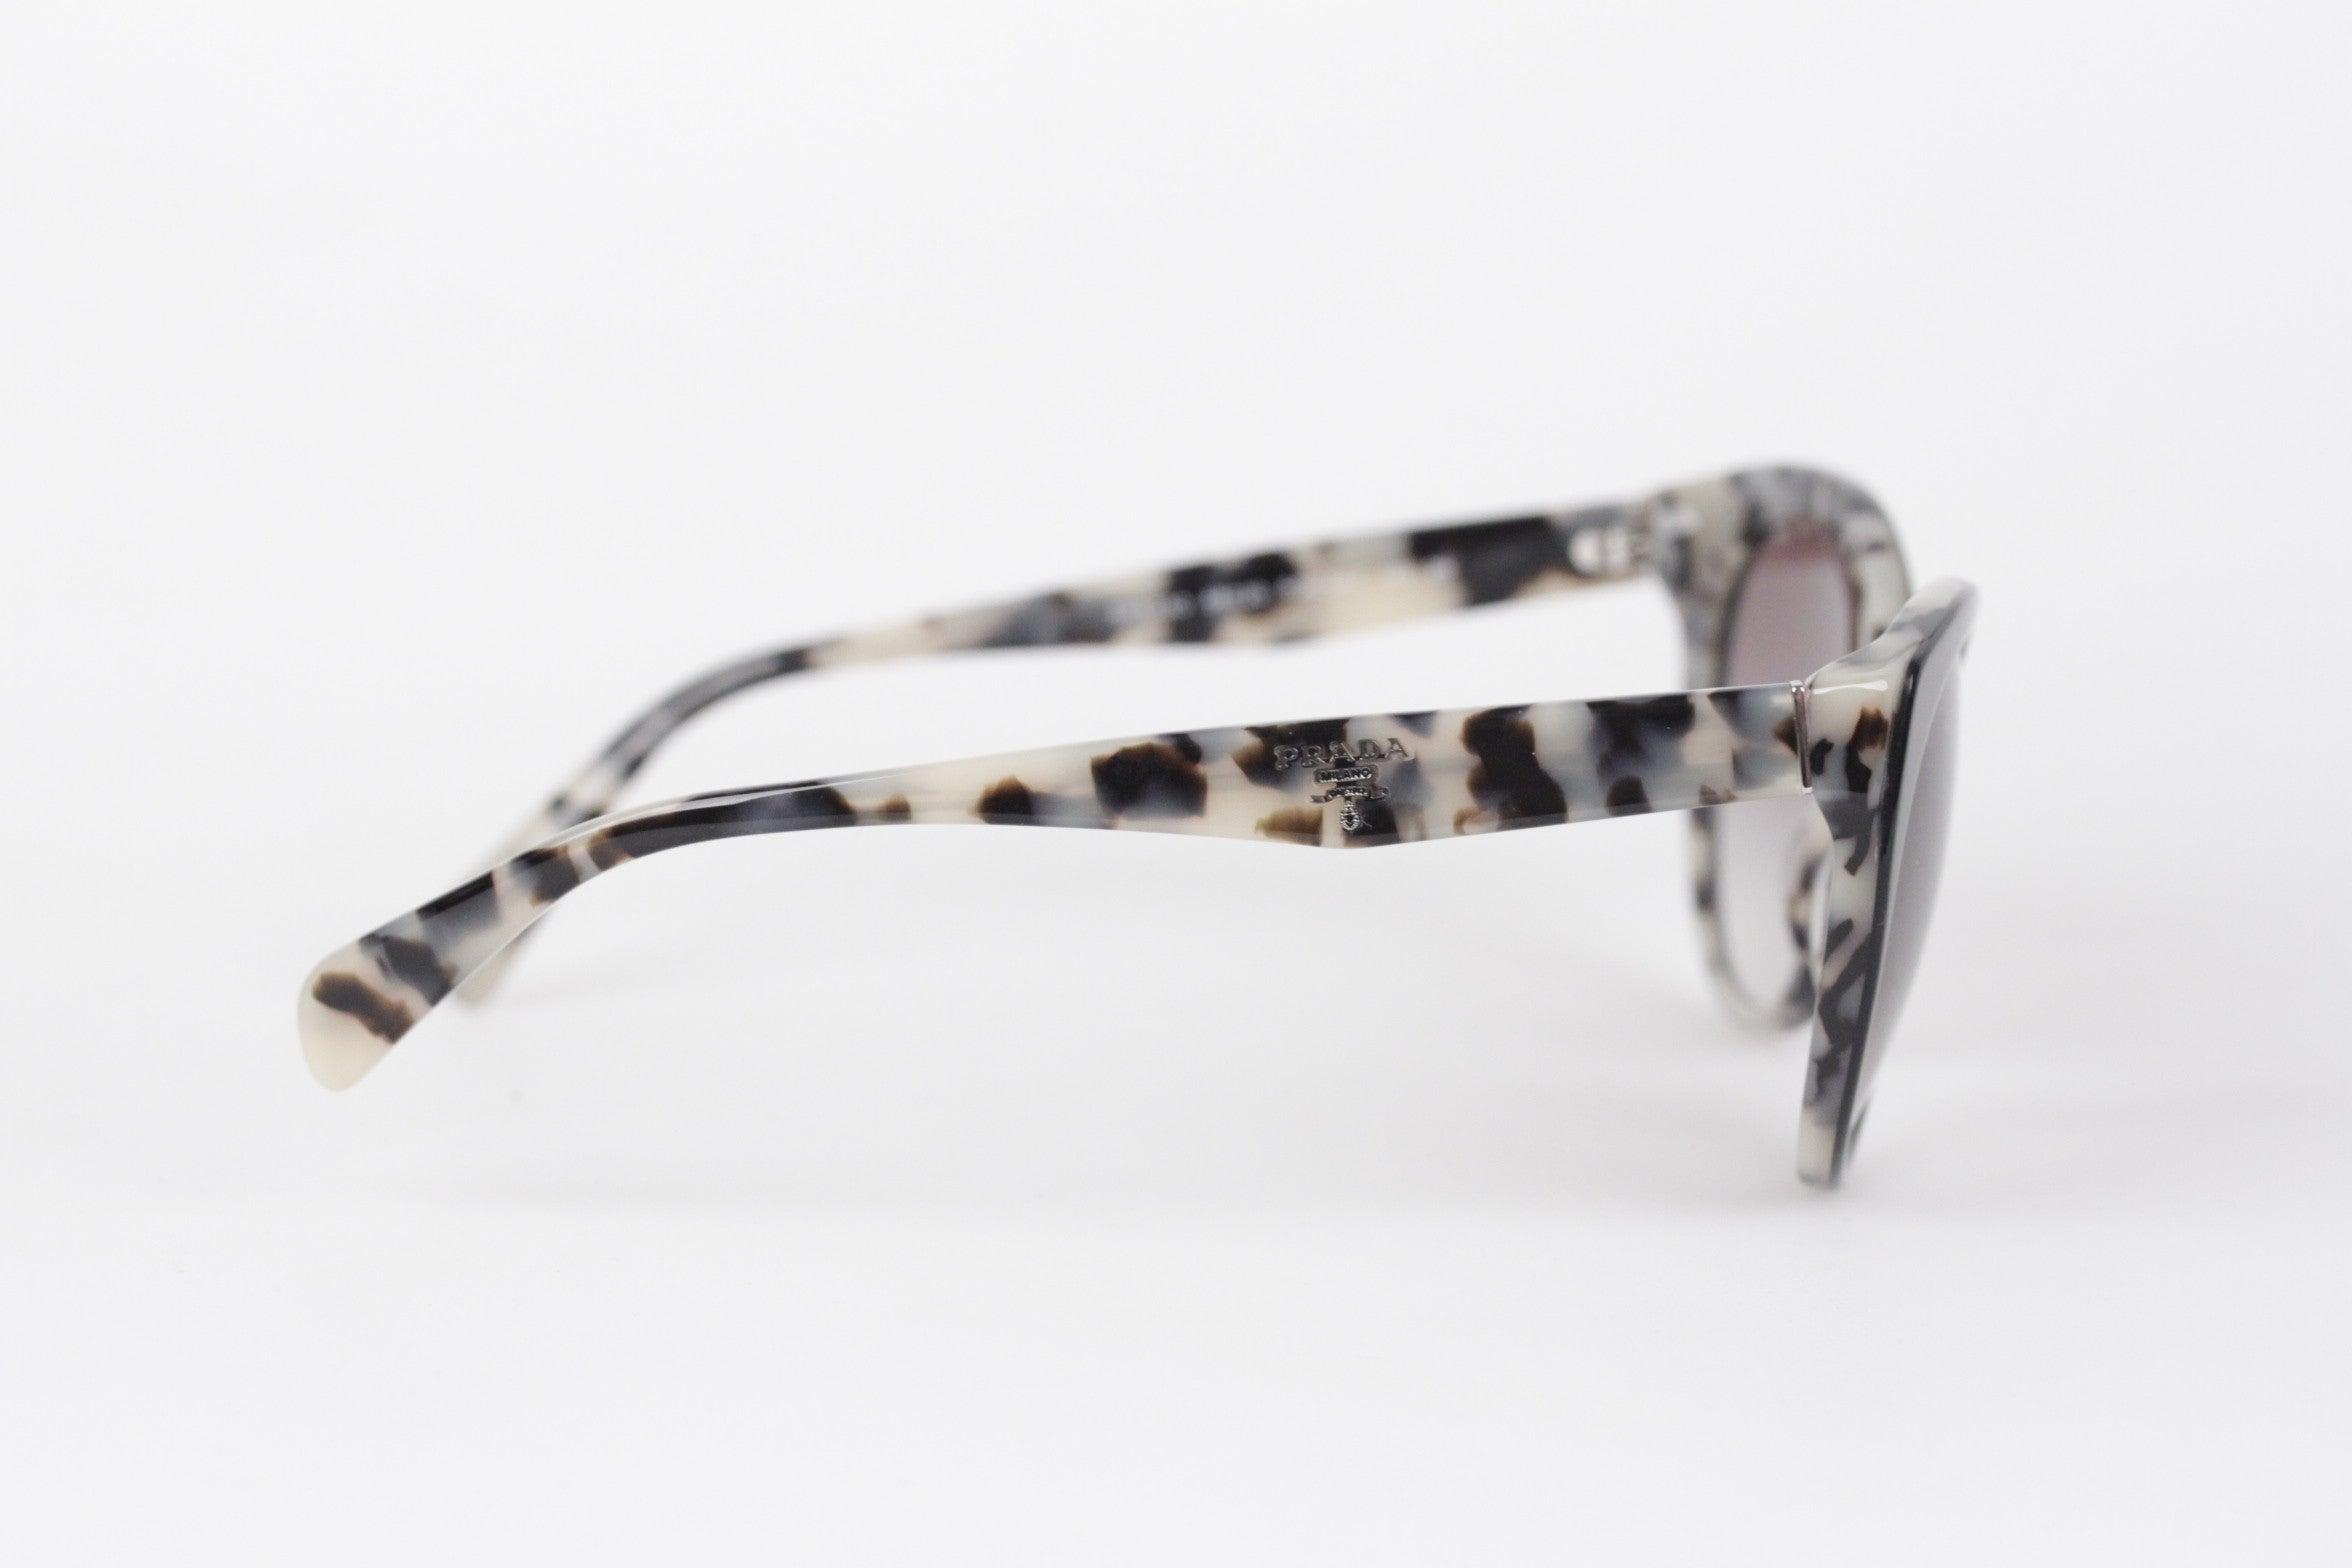 fe6674939183 PRADA Sunglasses SPR 230 56 20 140 2N ANIMALIER pattern w CASE and BOX at  1stdibs